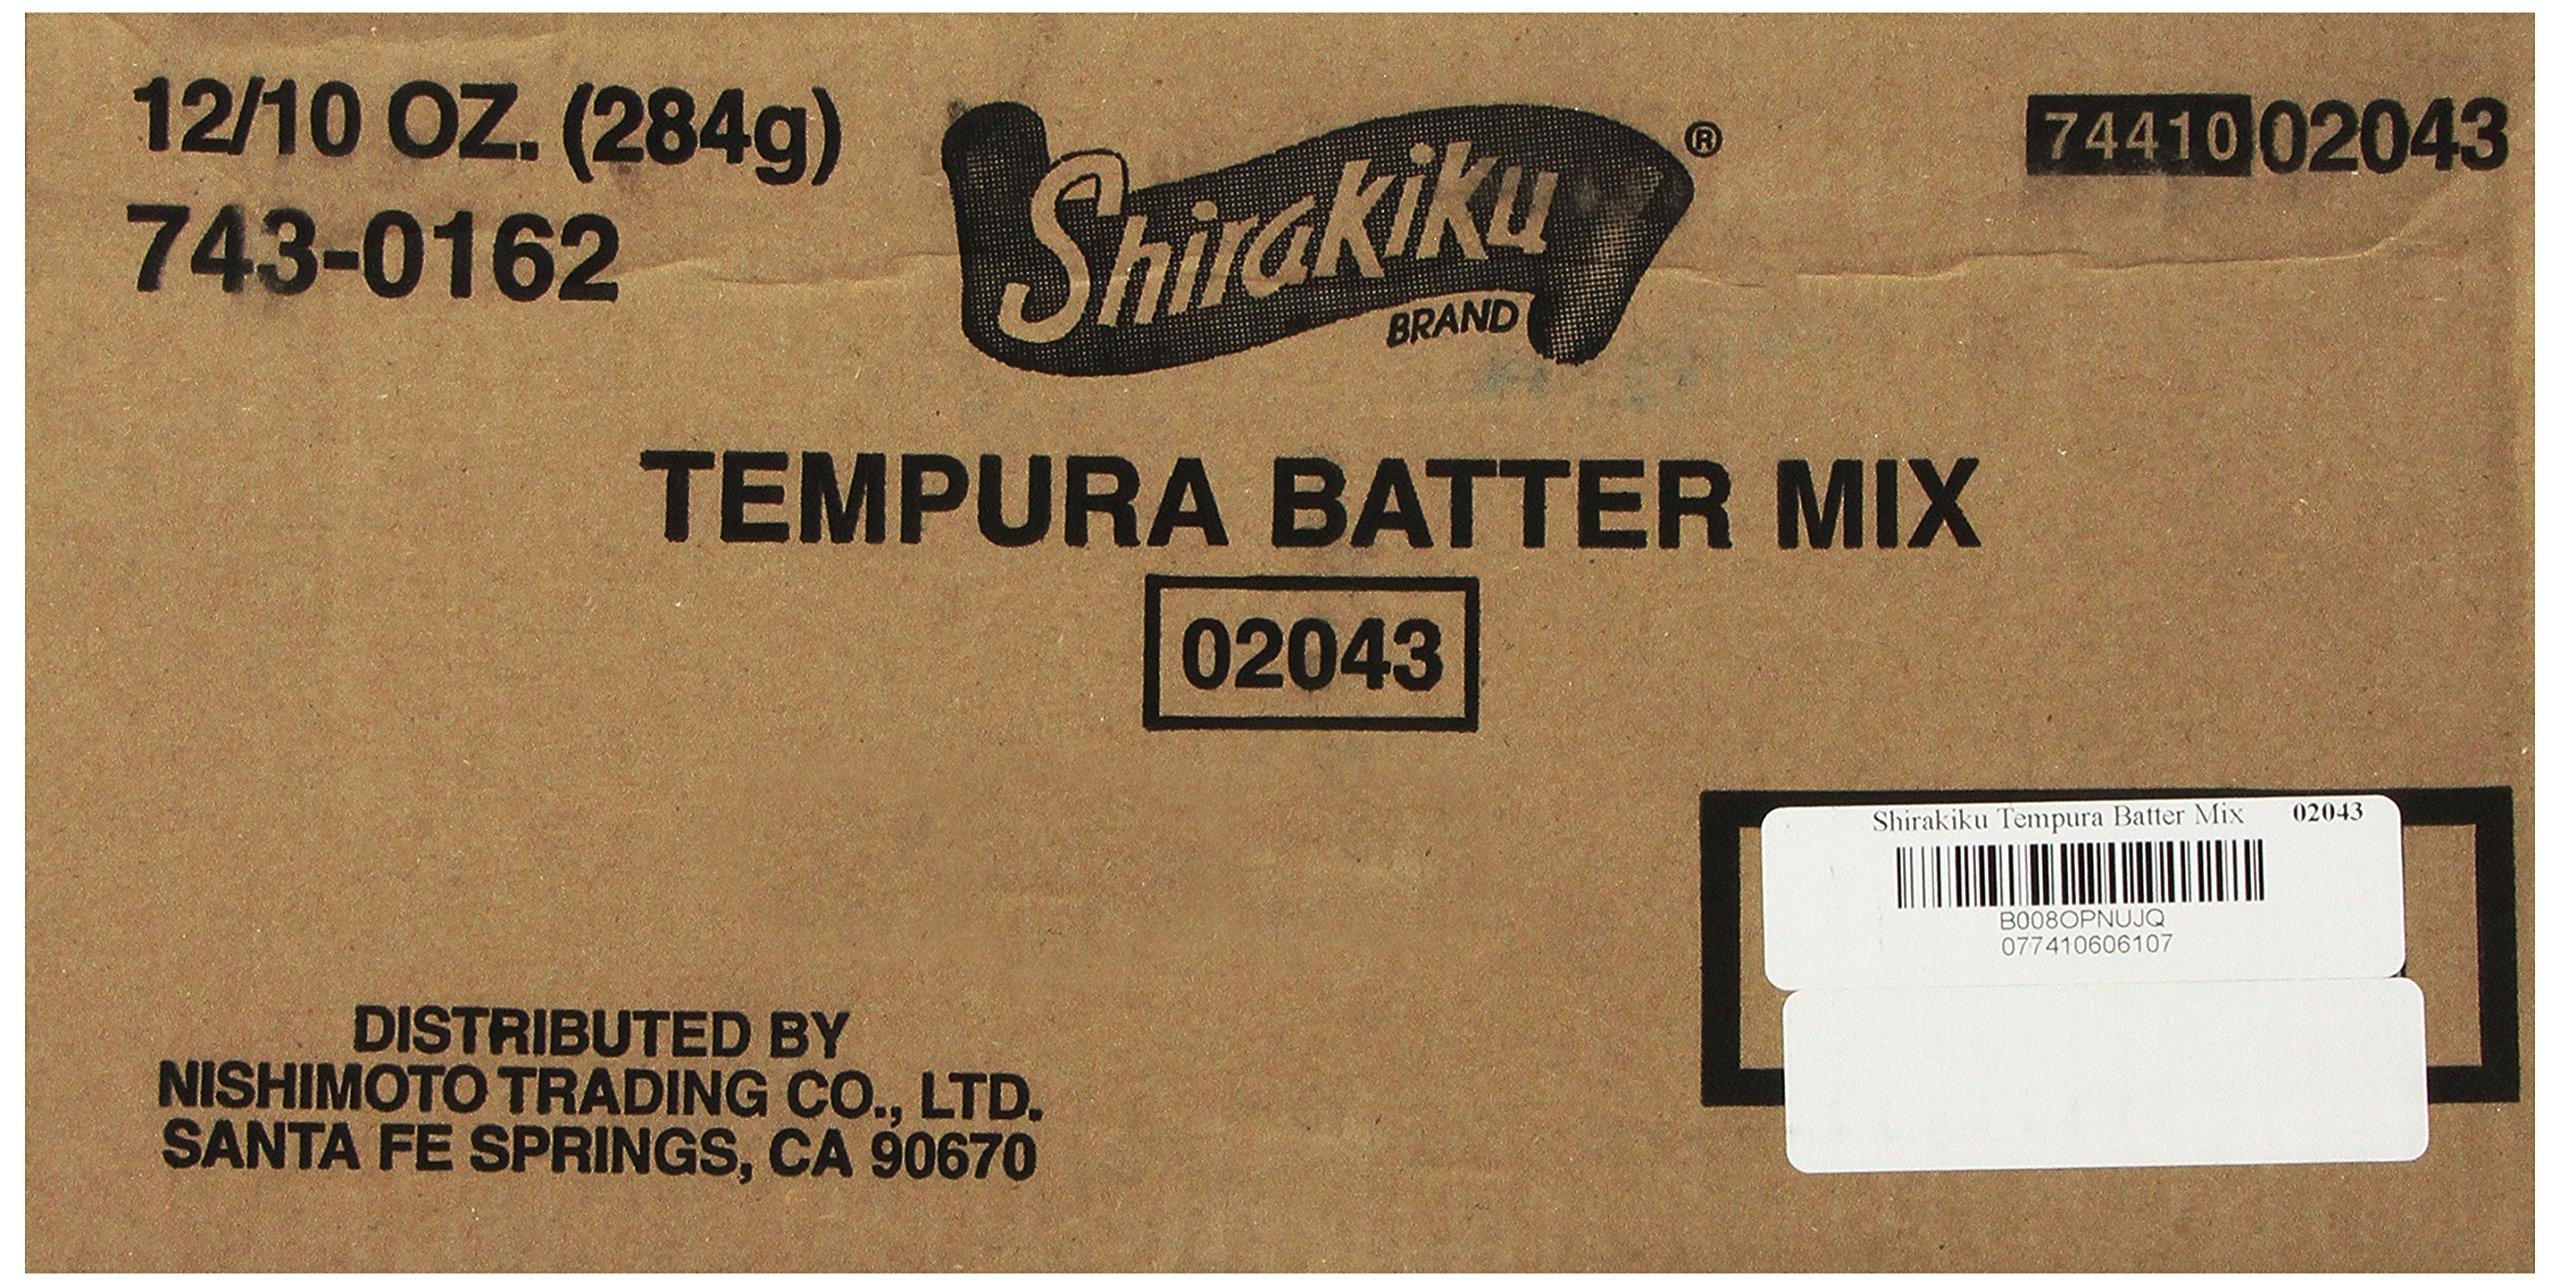 Shirakiku Tempura Batter Mix, 10-Ounce (Pack of 12) by Shirakiku (Image #4)